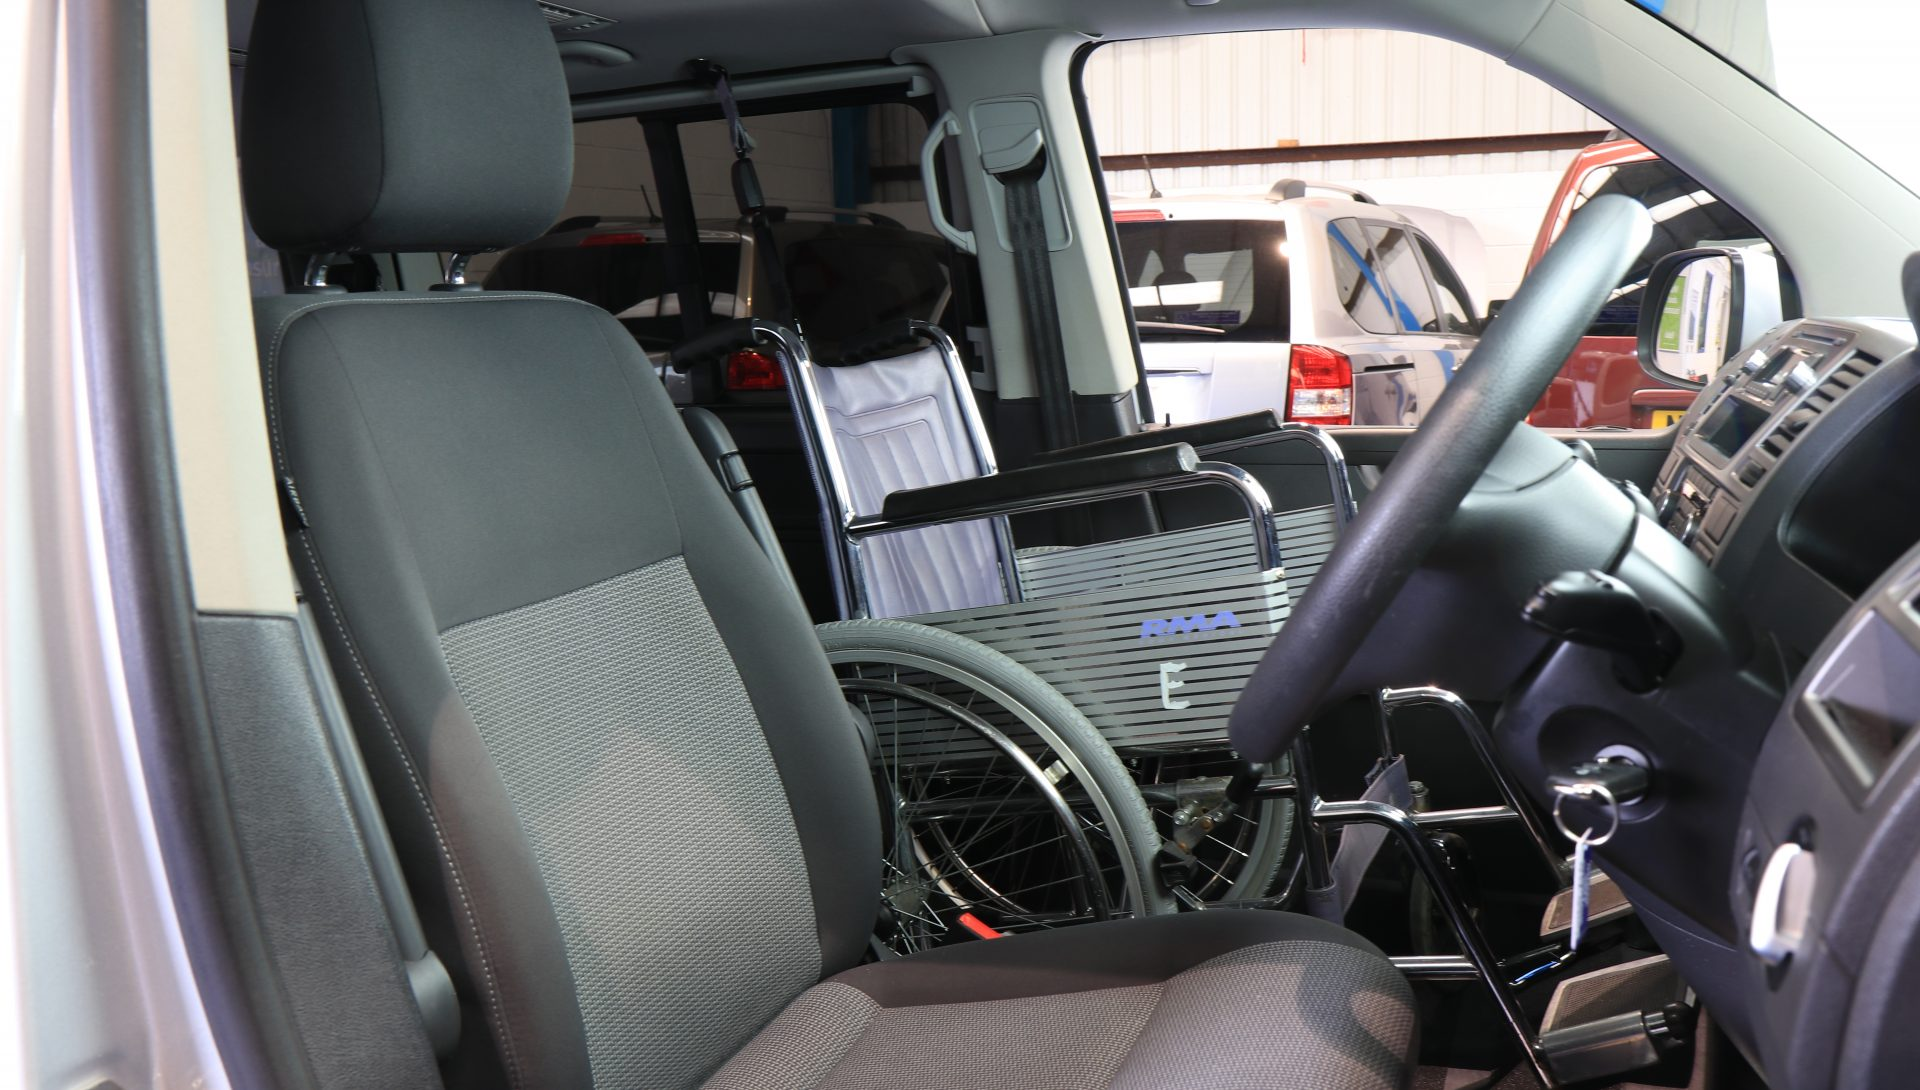 Transporter passenger upfront next to driver